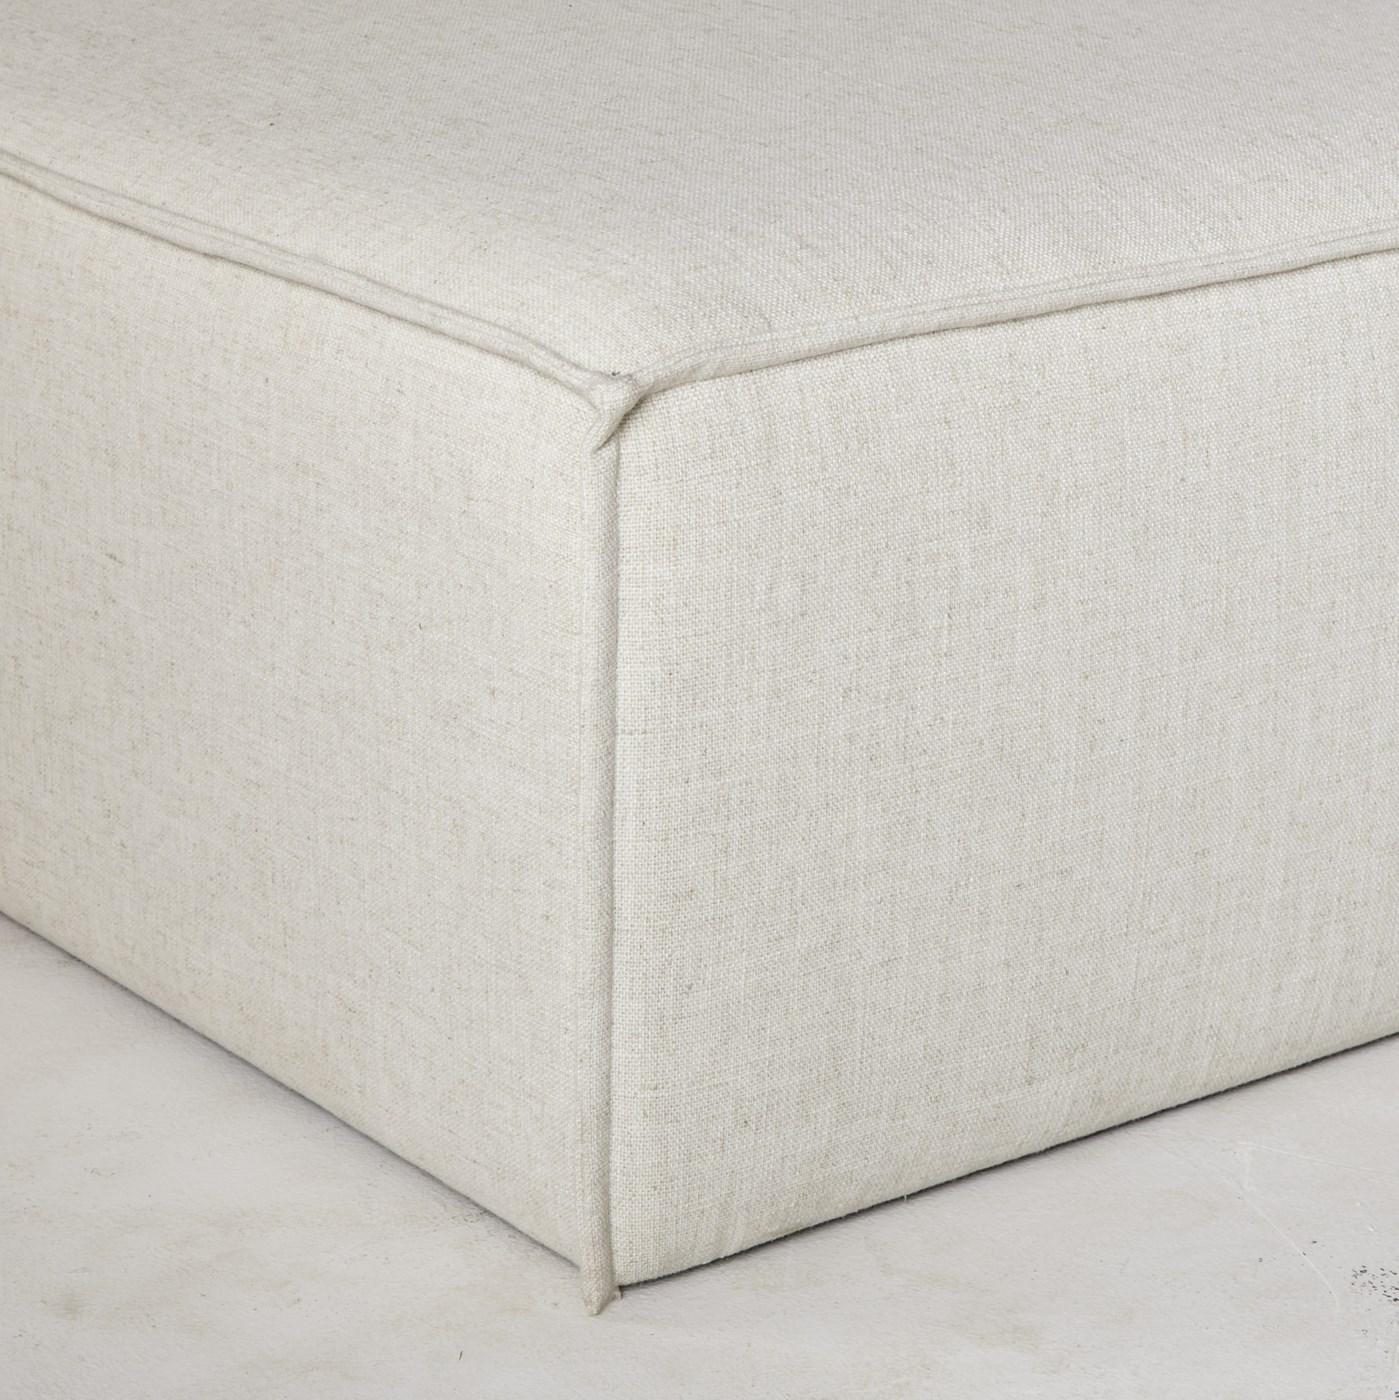 Charlton Modular Sofa - Armless Chair - Grade 1